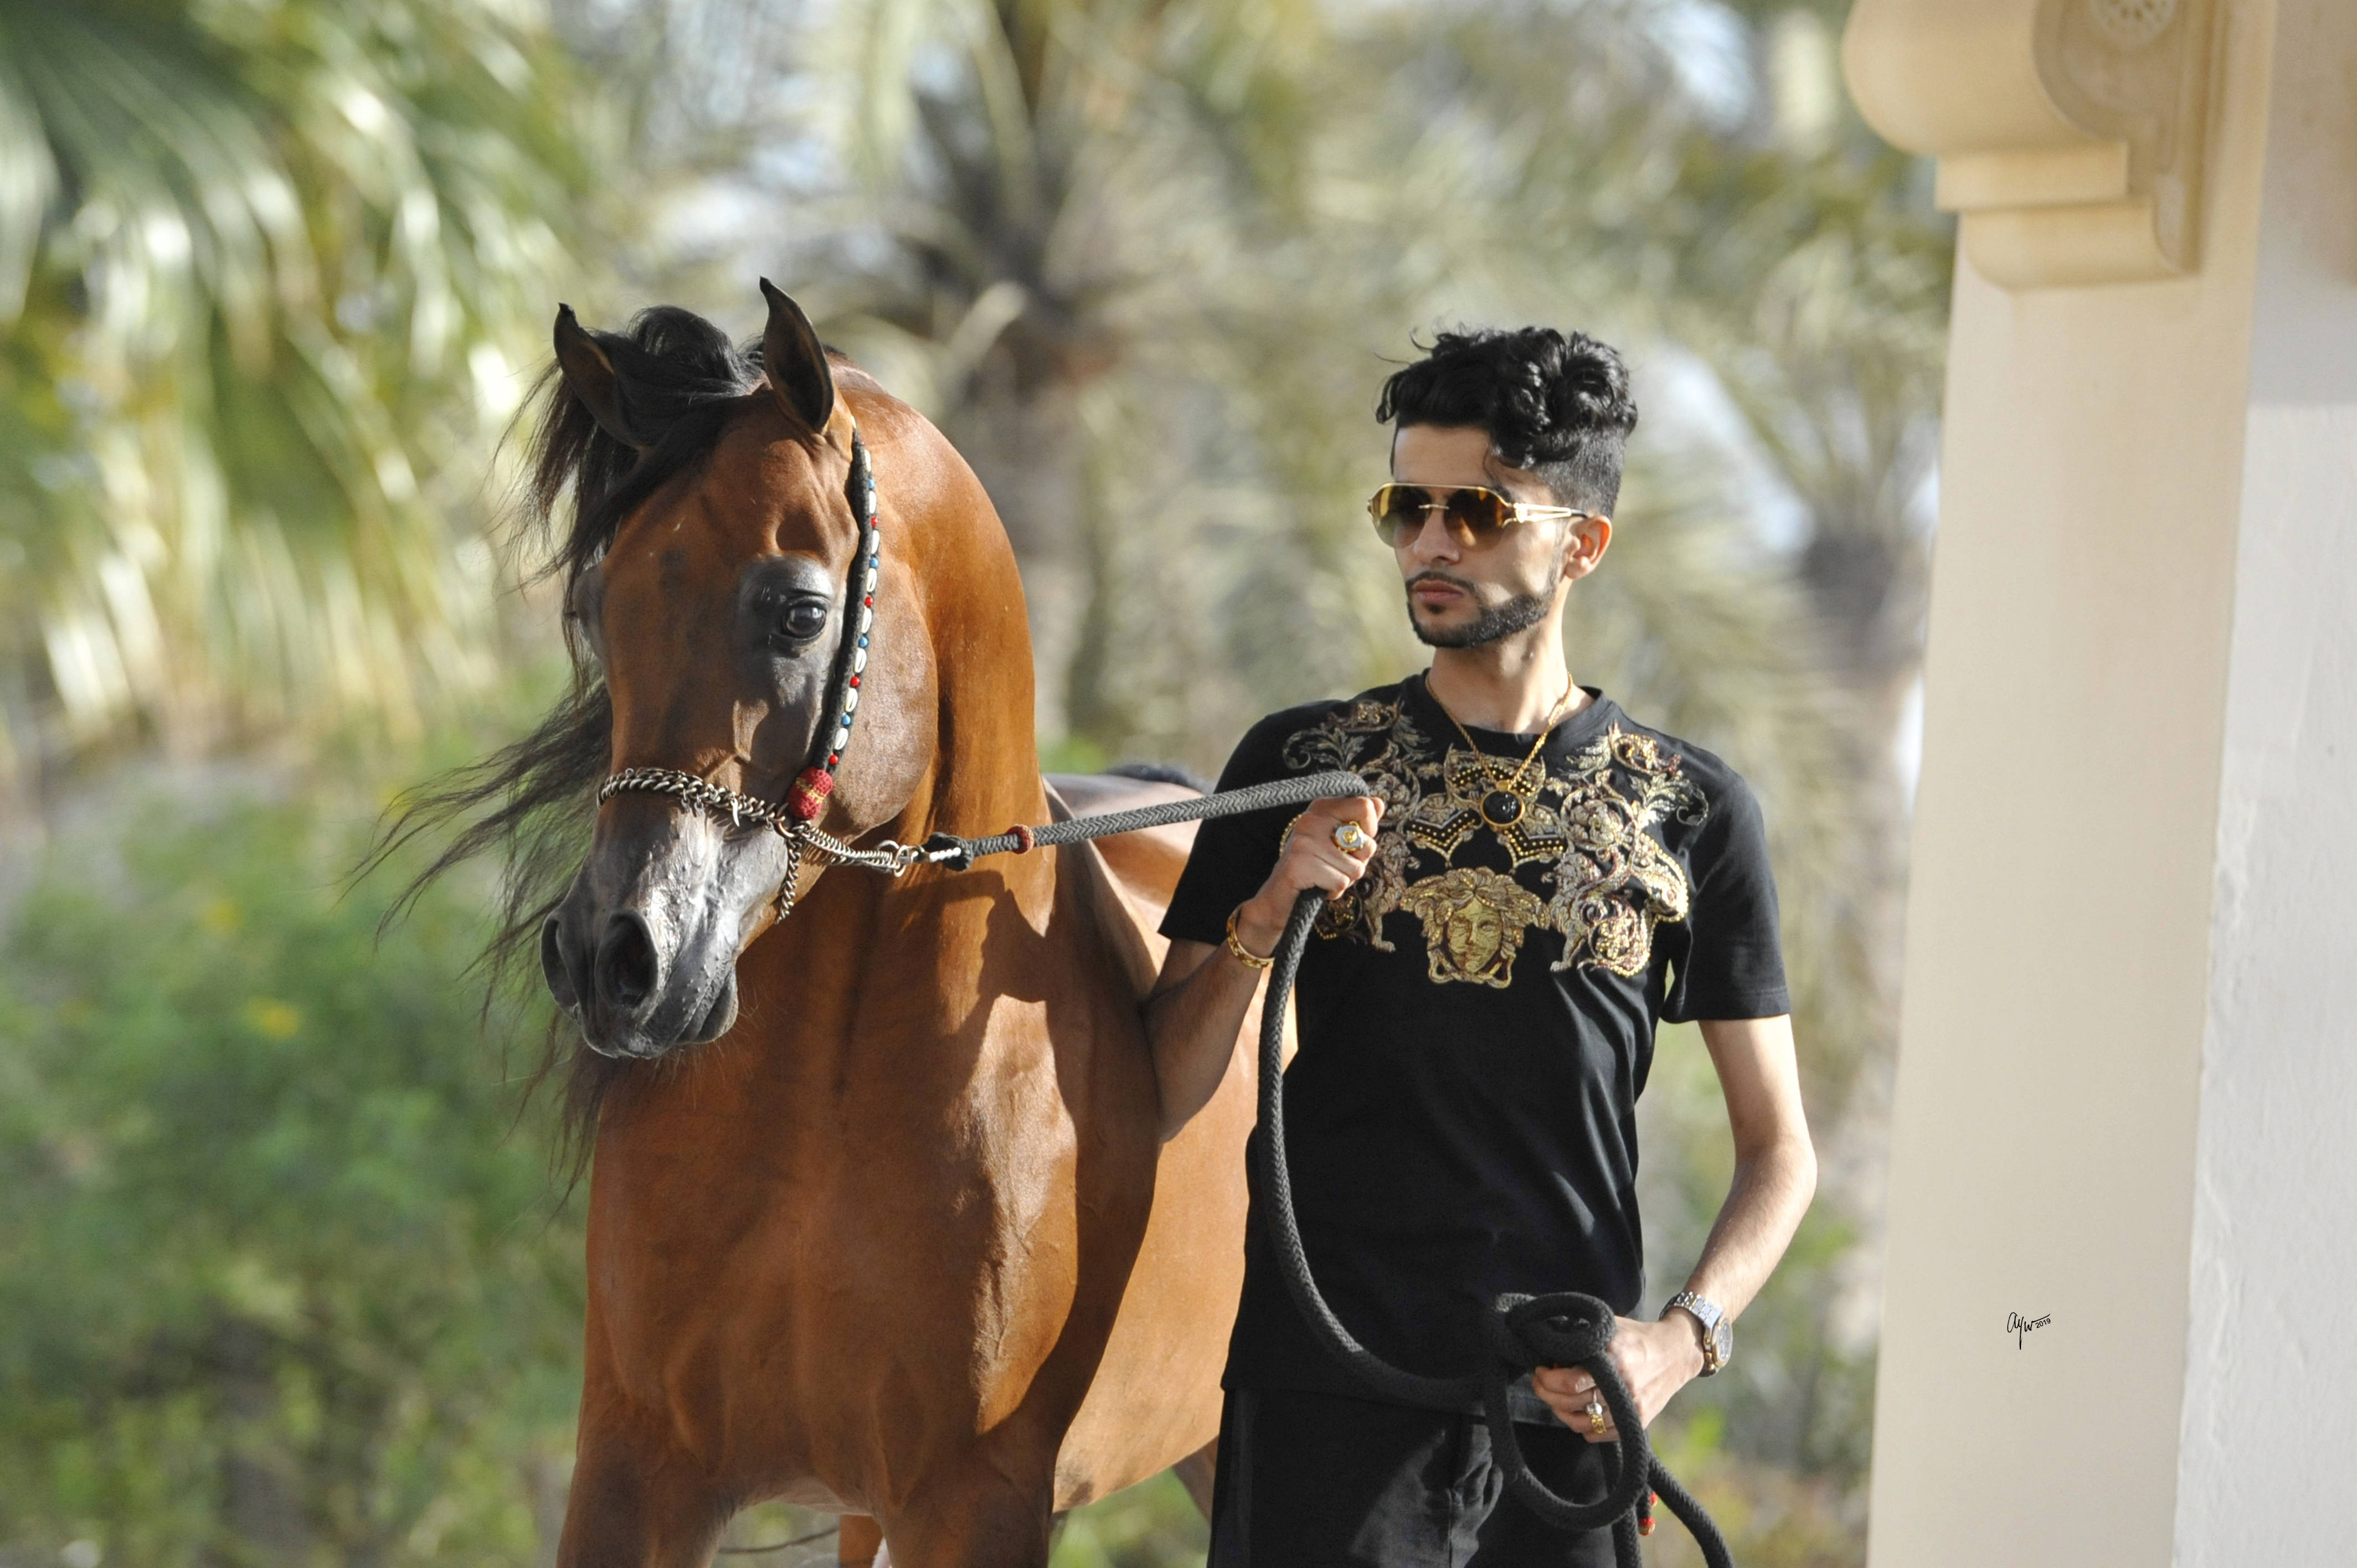 Nader Al Rashediah